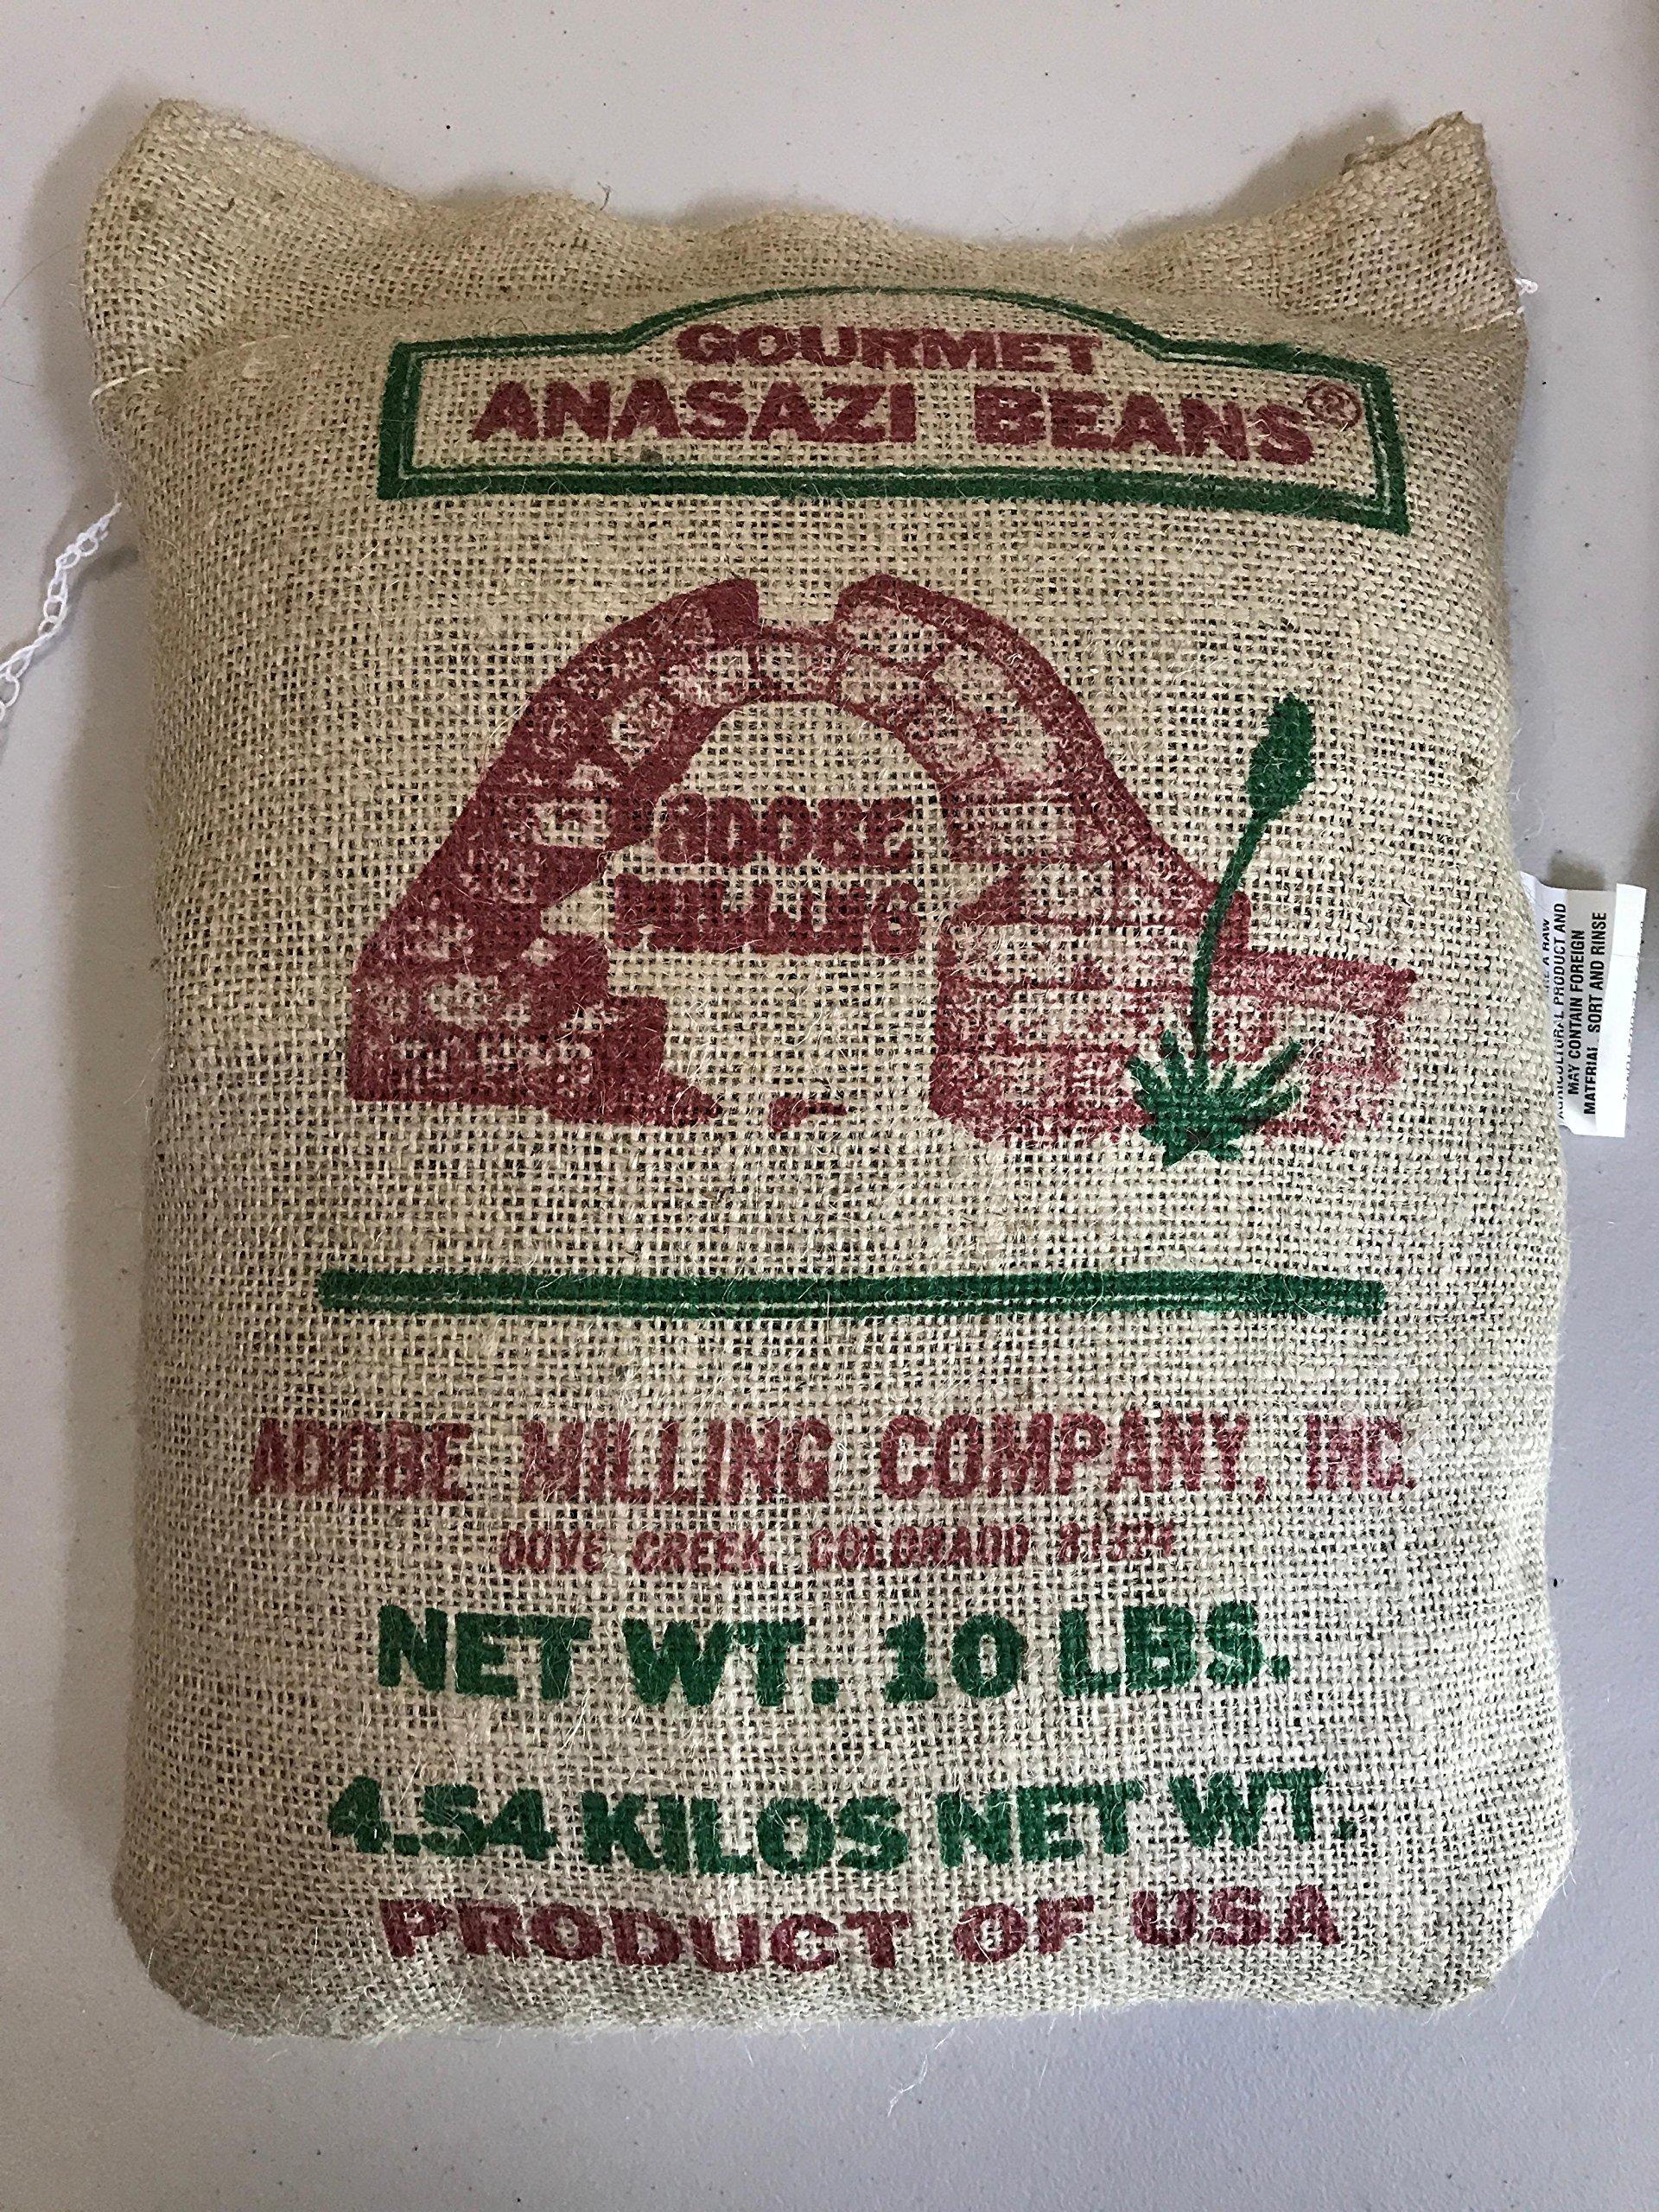 adobe milling Anasazi Beans 10 lb burlap bag by Adobe milling co